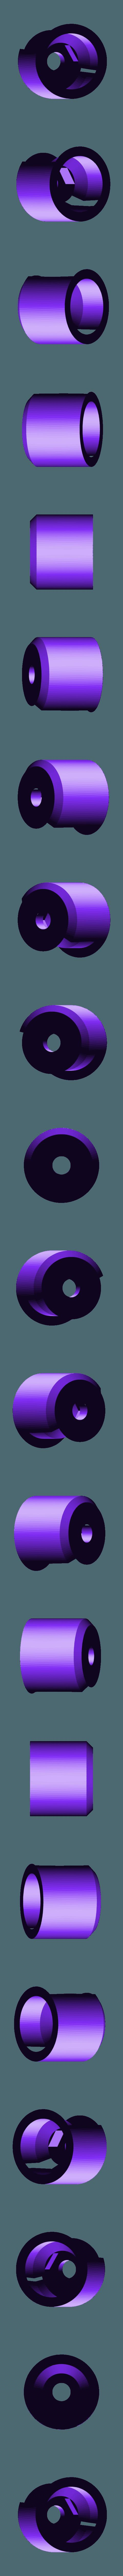 knob.stl Download free STL file PCB Vise – Soldering Station • 3D printing model, Job